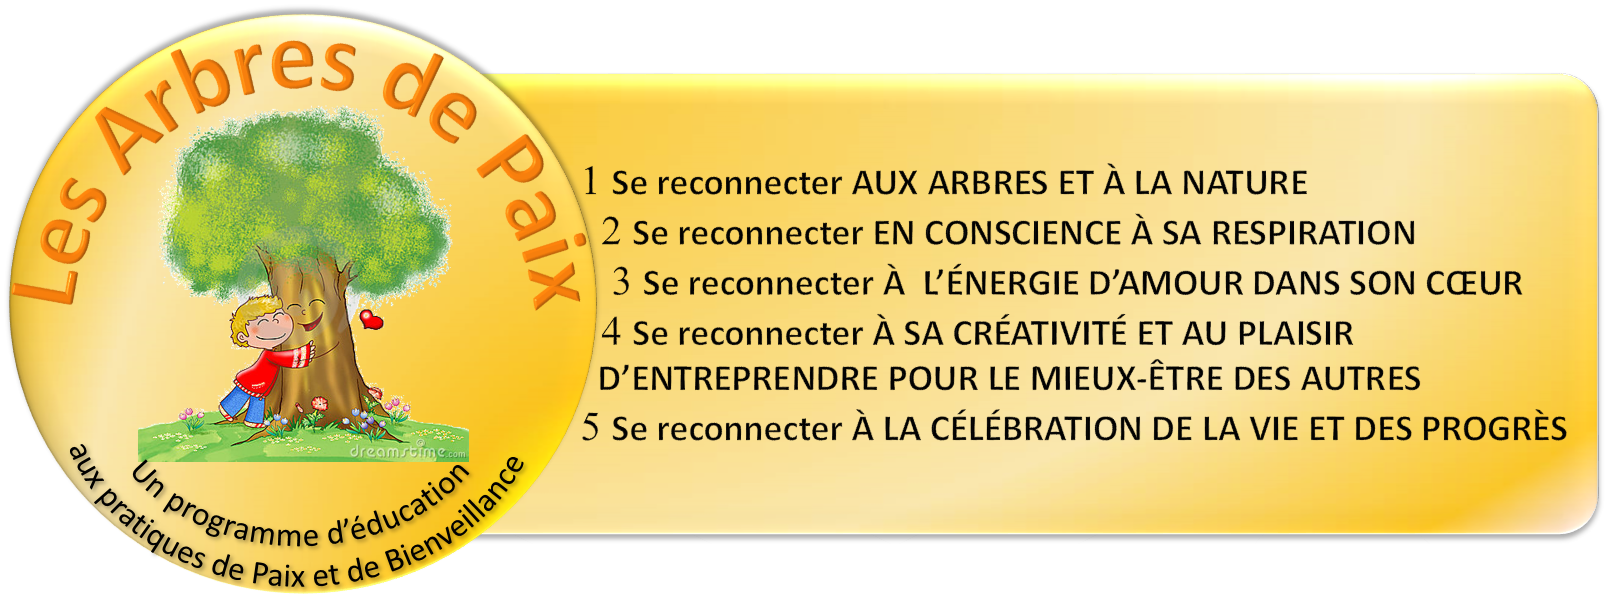 5 clés de reconnexion